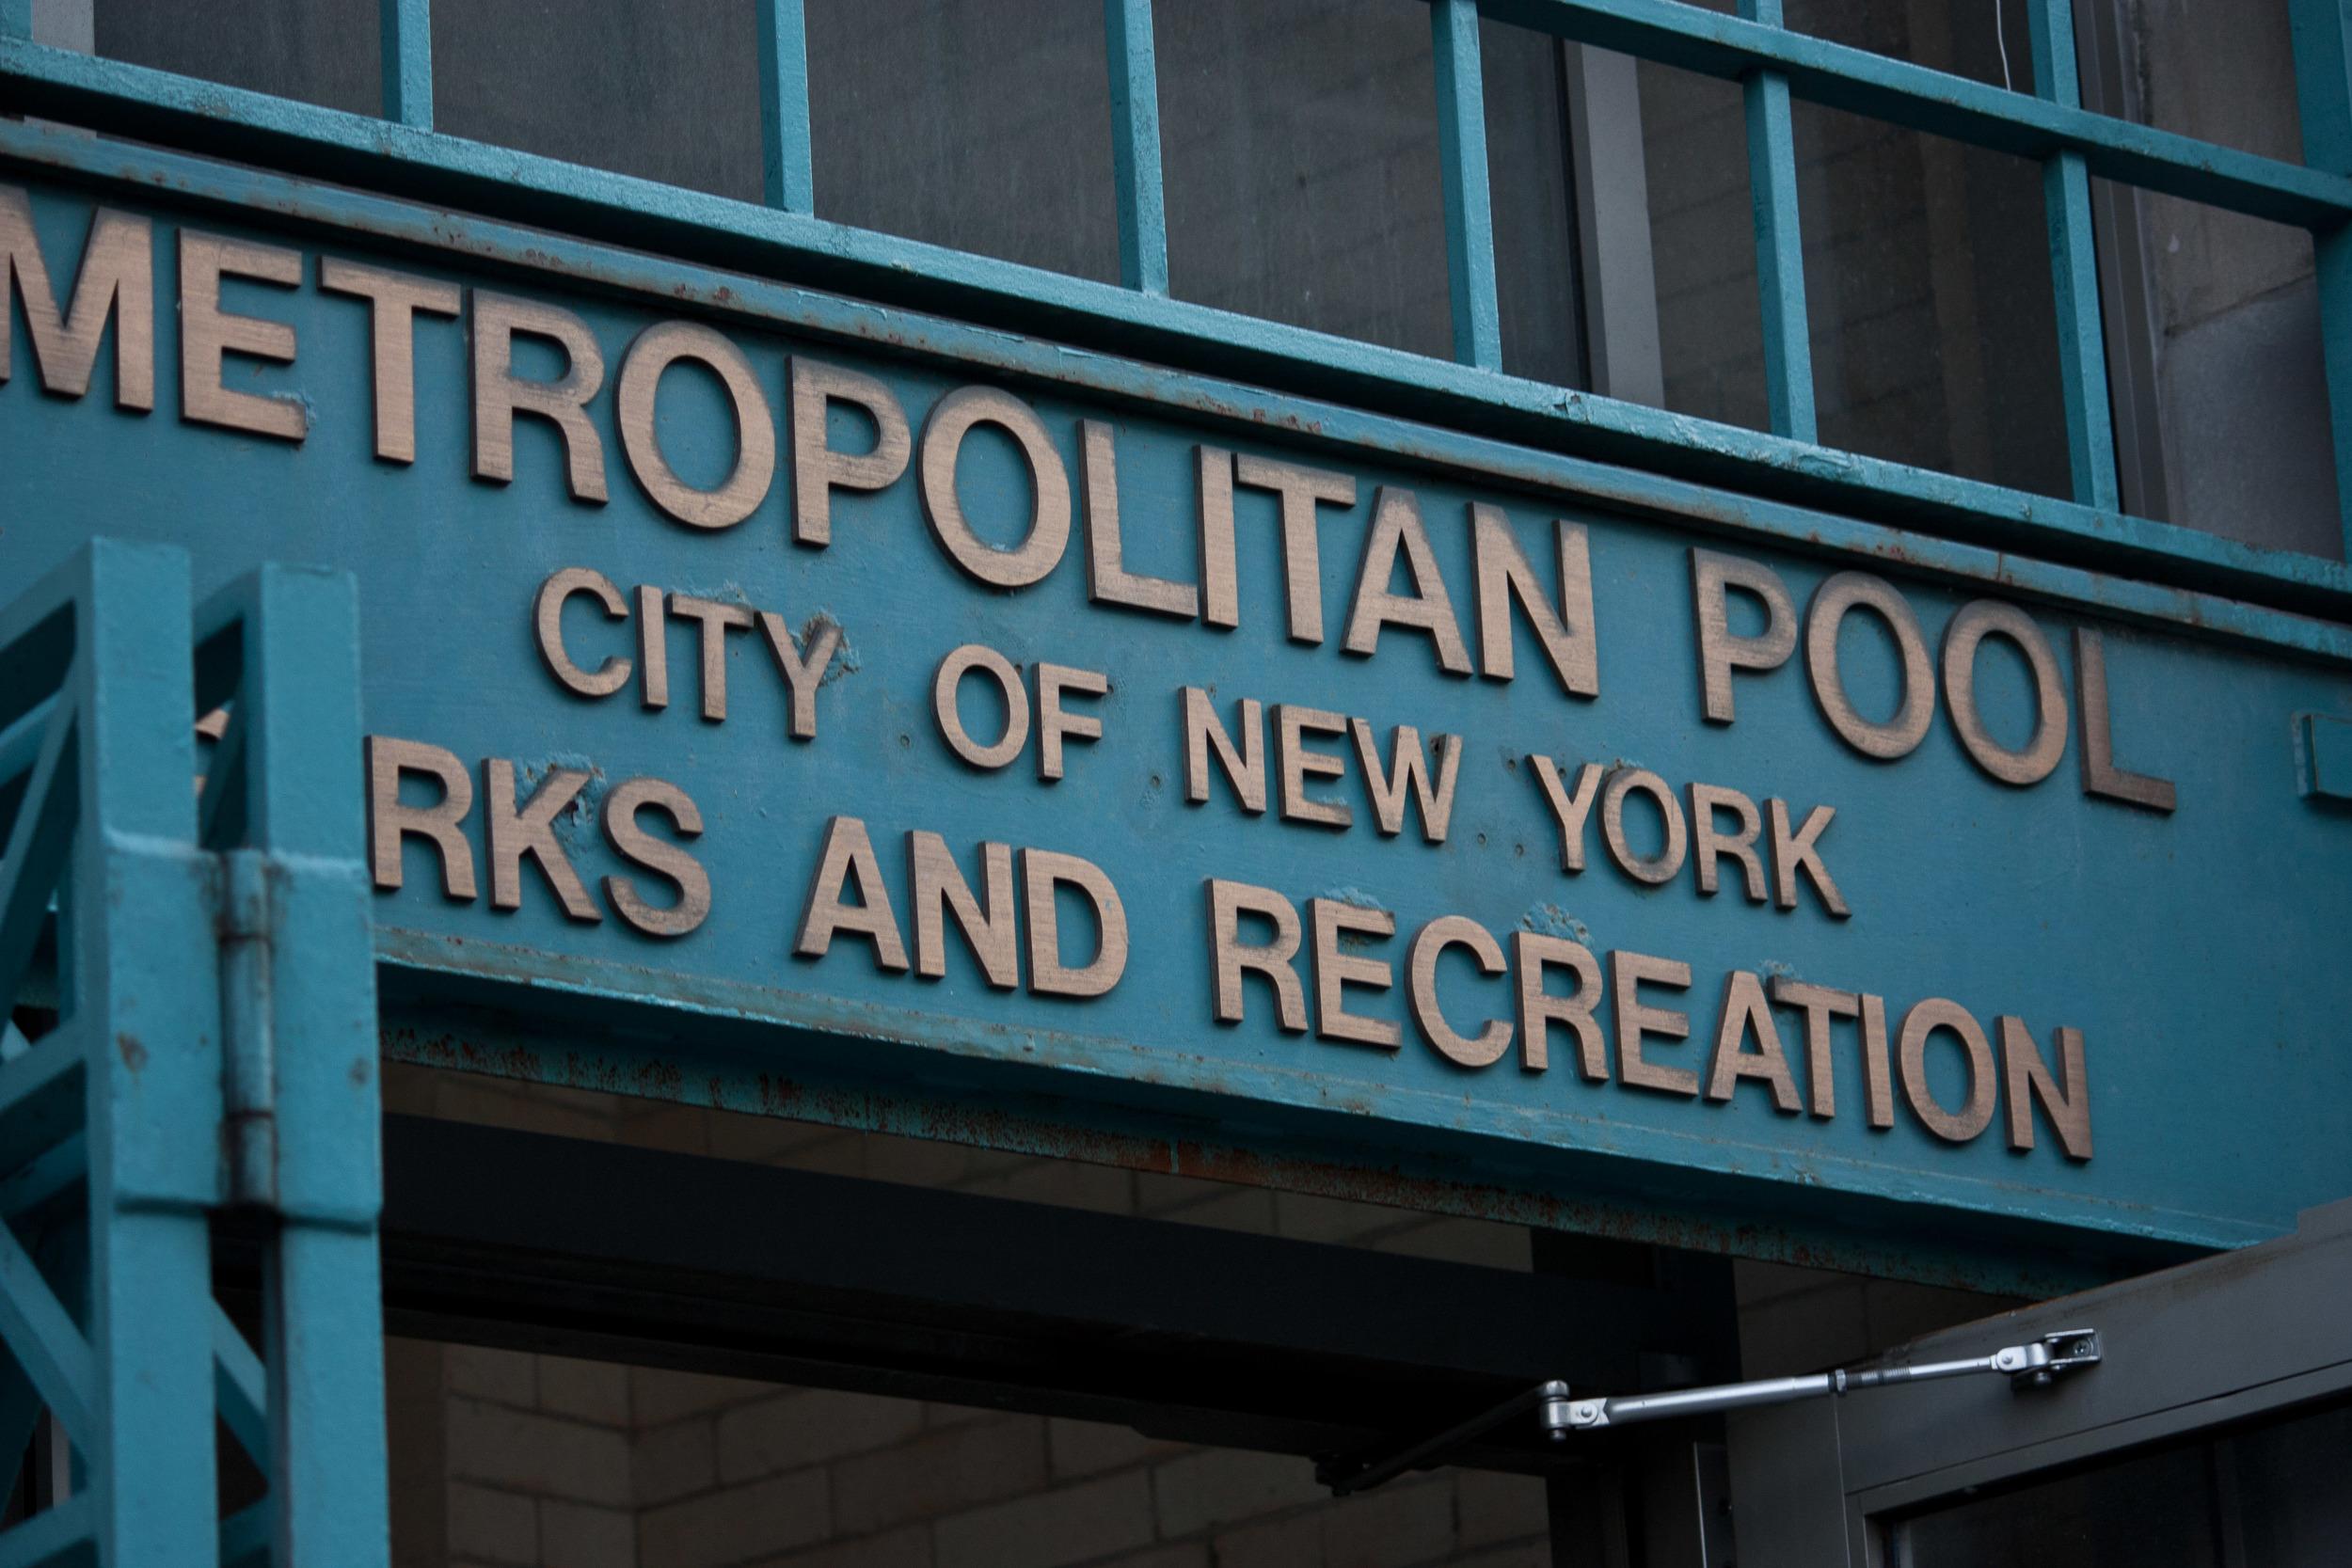 alue optics metropolitan pool new york